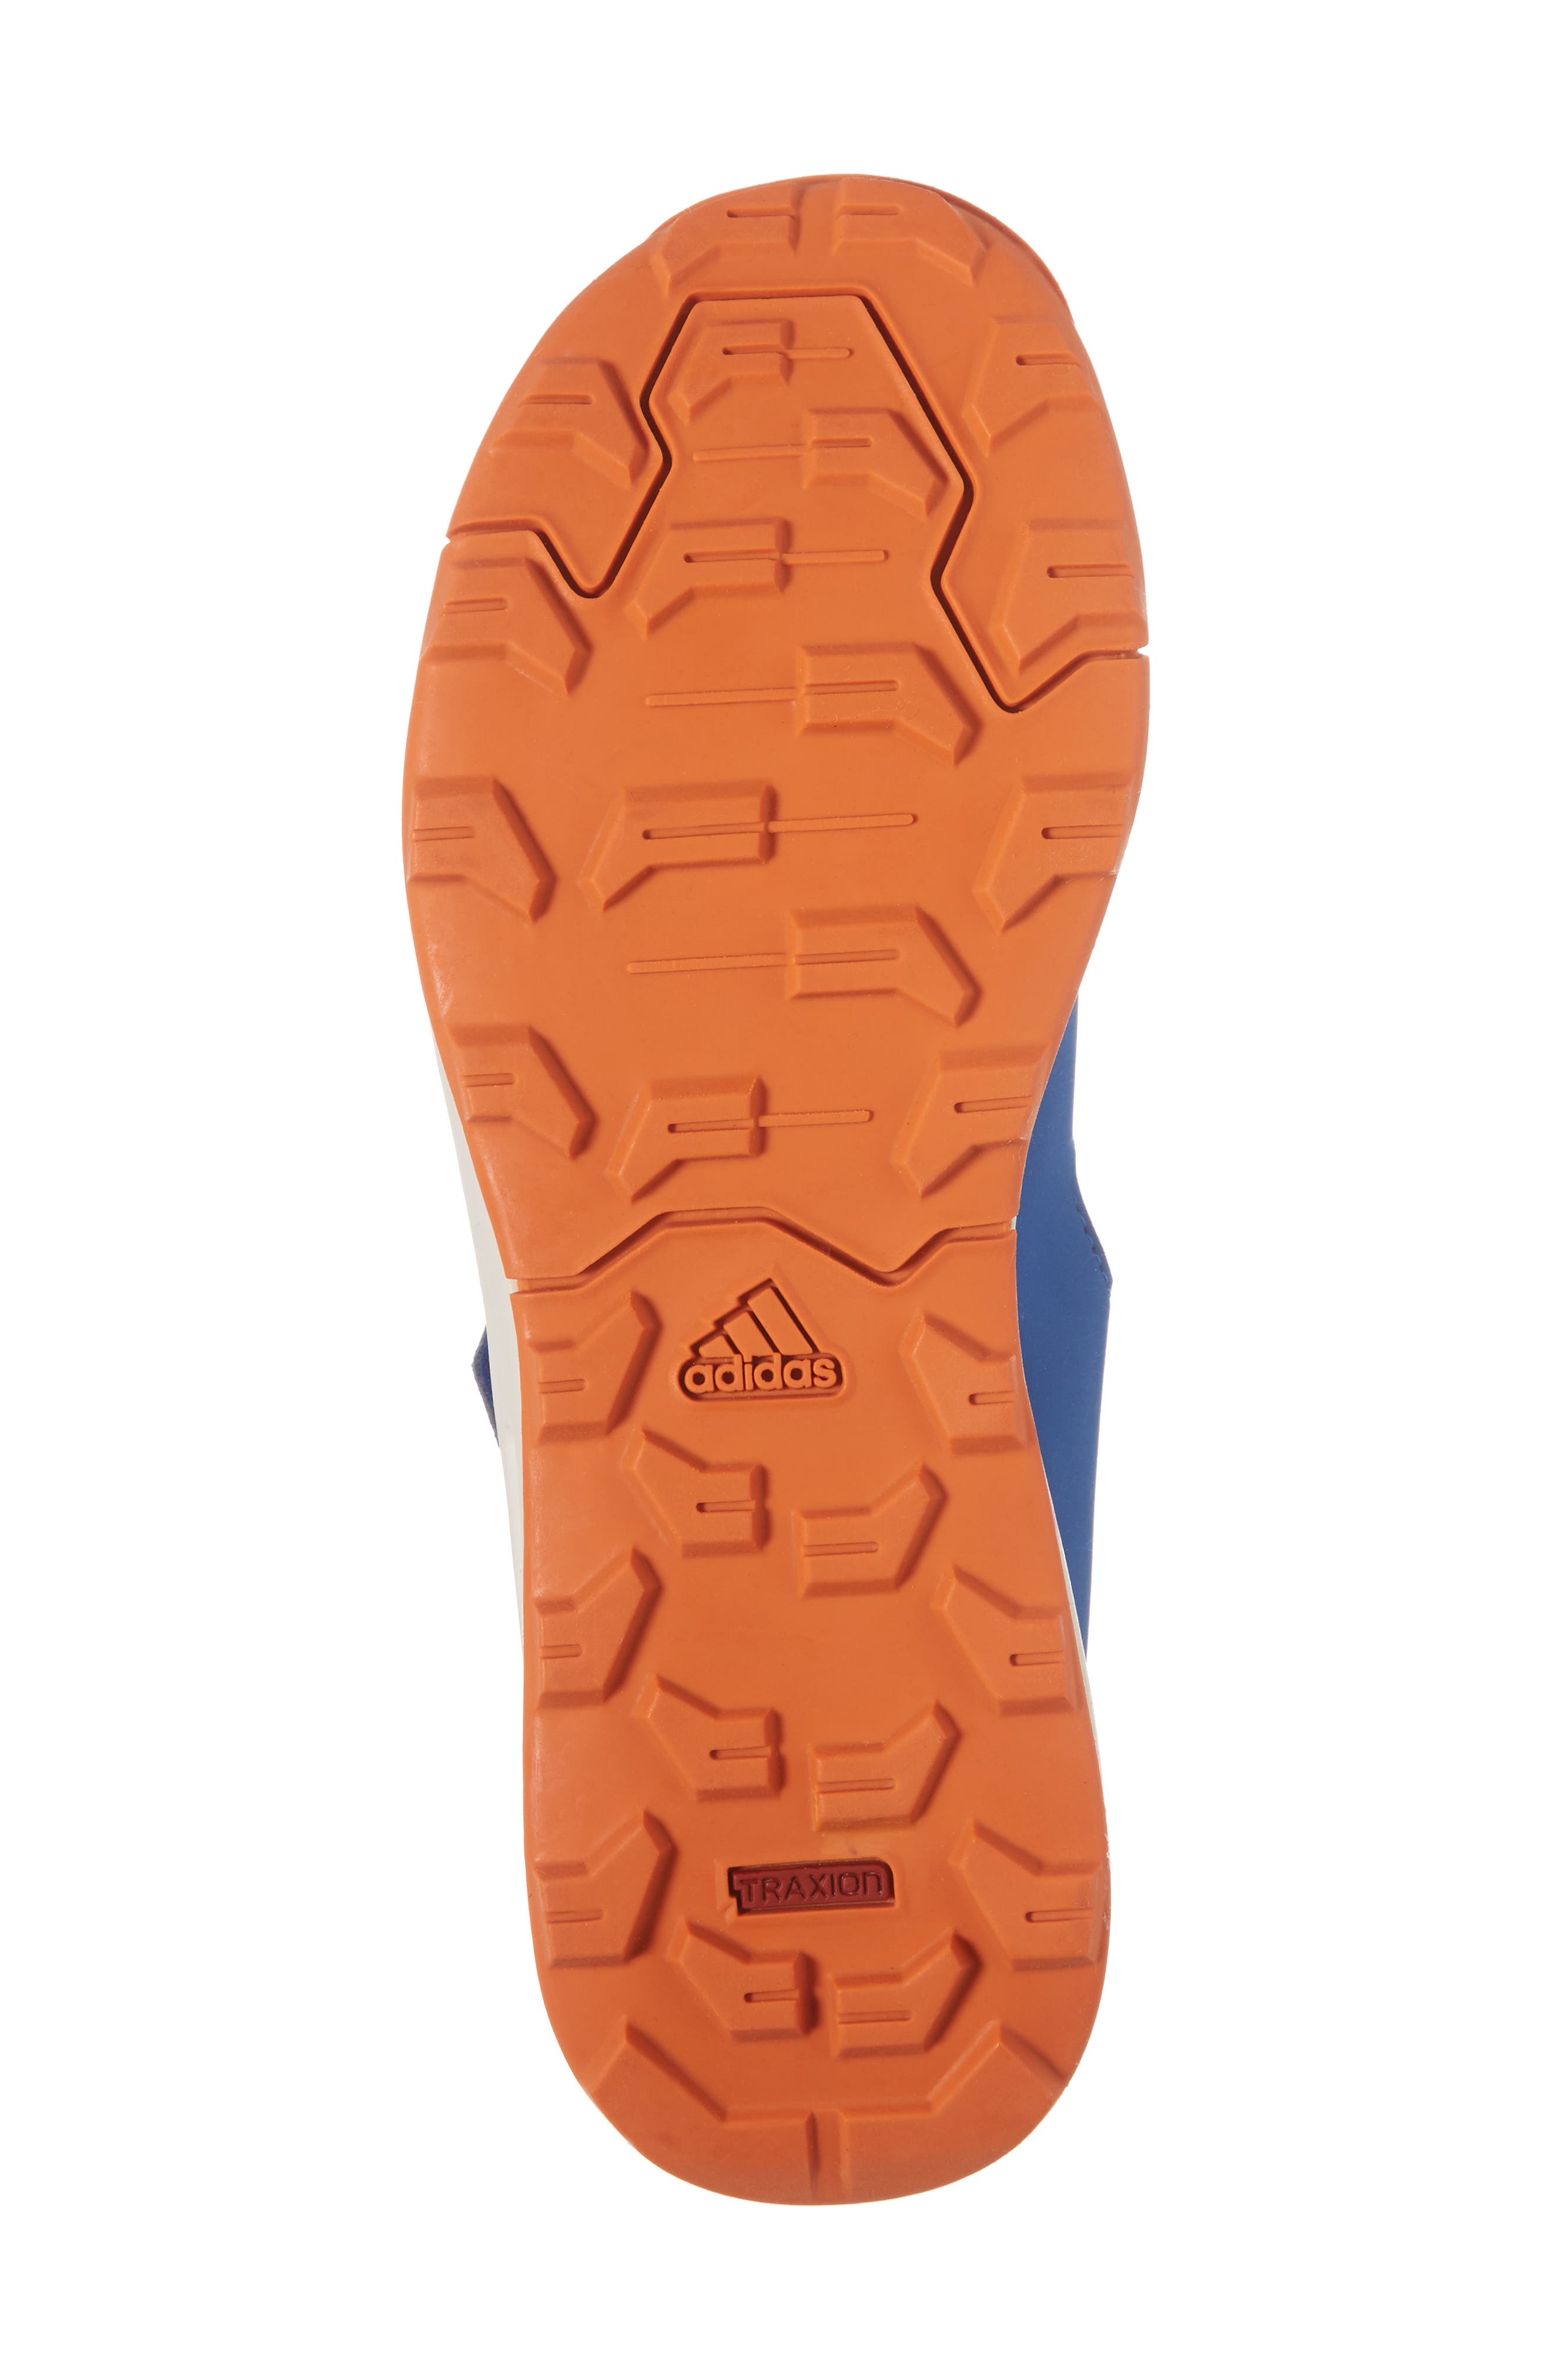 Terrex Tivid Sneaker,                             Alternate thumbnail 6, color,                             BLUE/ ORANGE/ CHALK WHITE